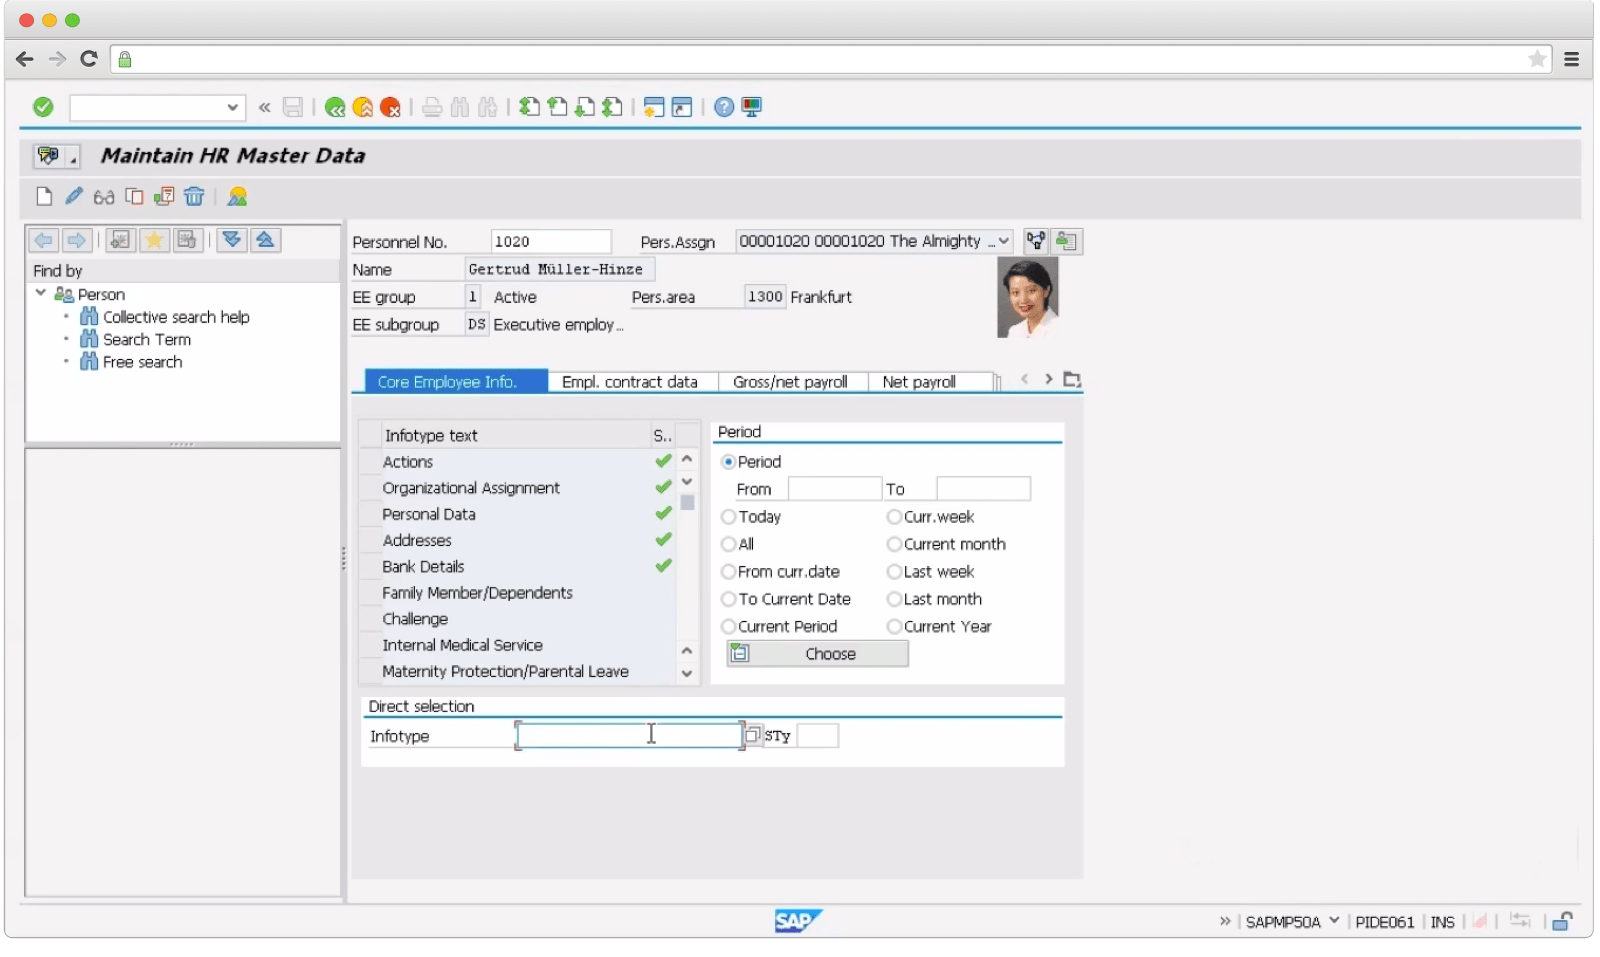 How SAP HCM looks like